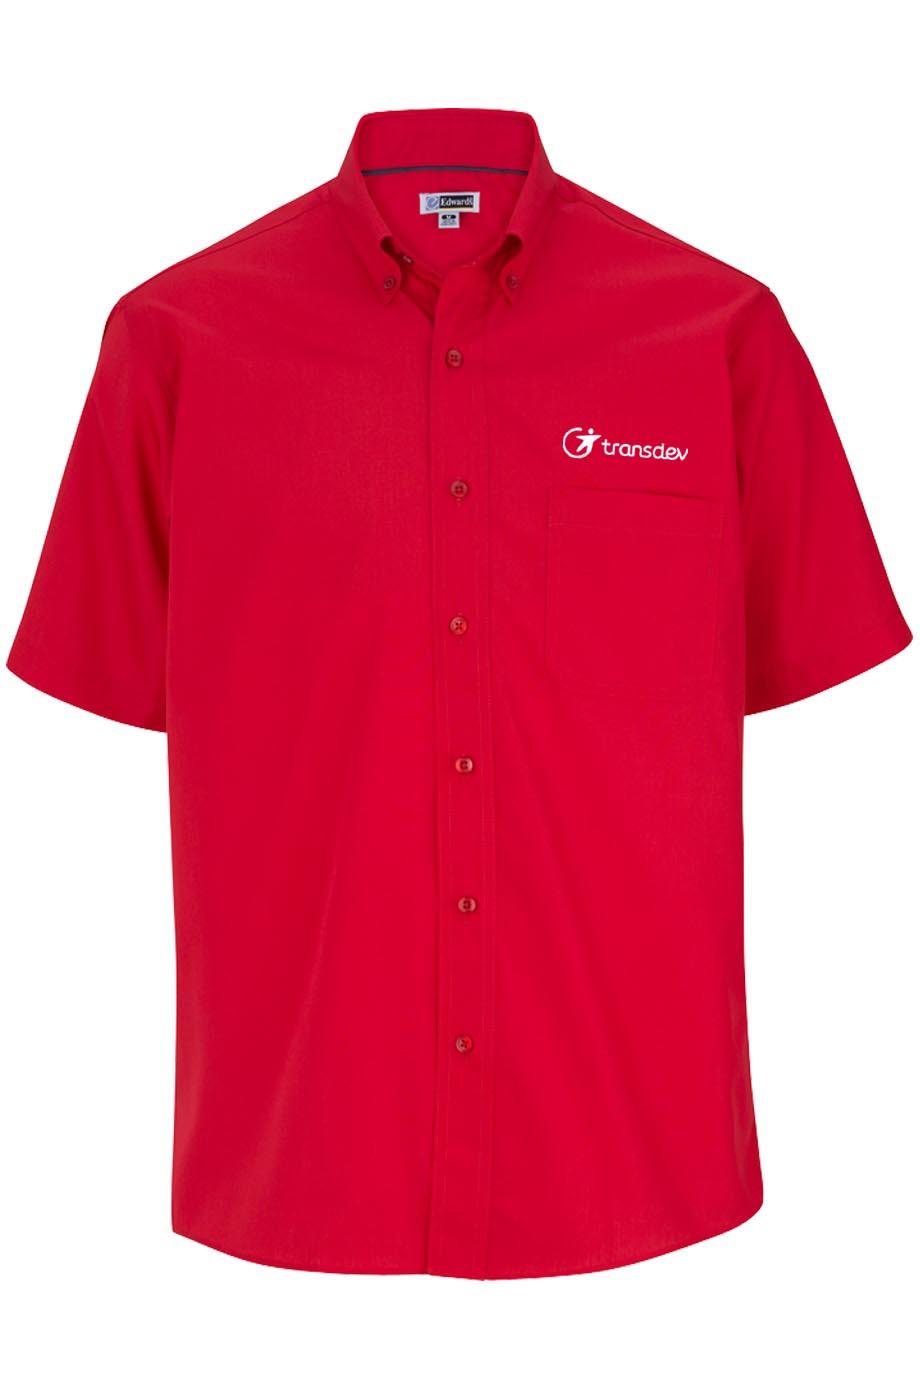 Edwards Mens Lightweight Short Sleeve Poplin Shirt-Capp Uniform Services